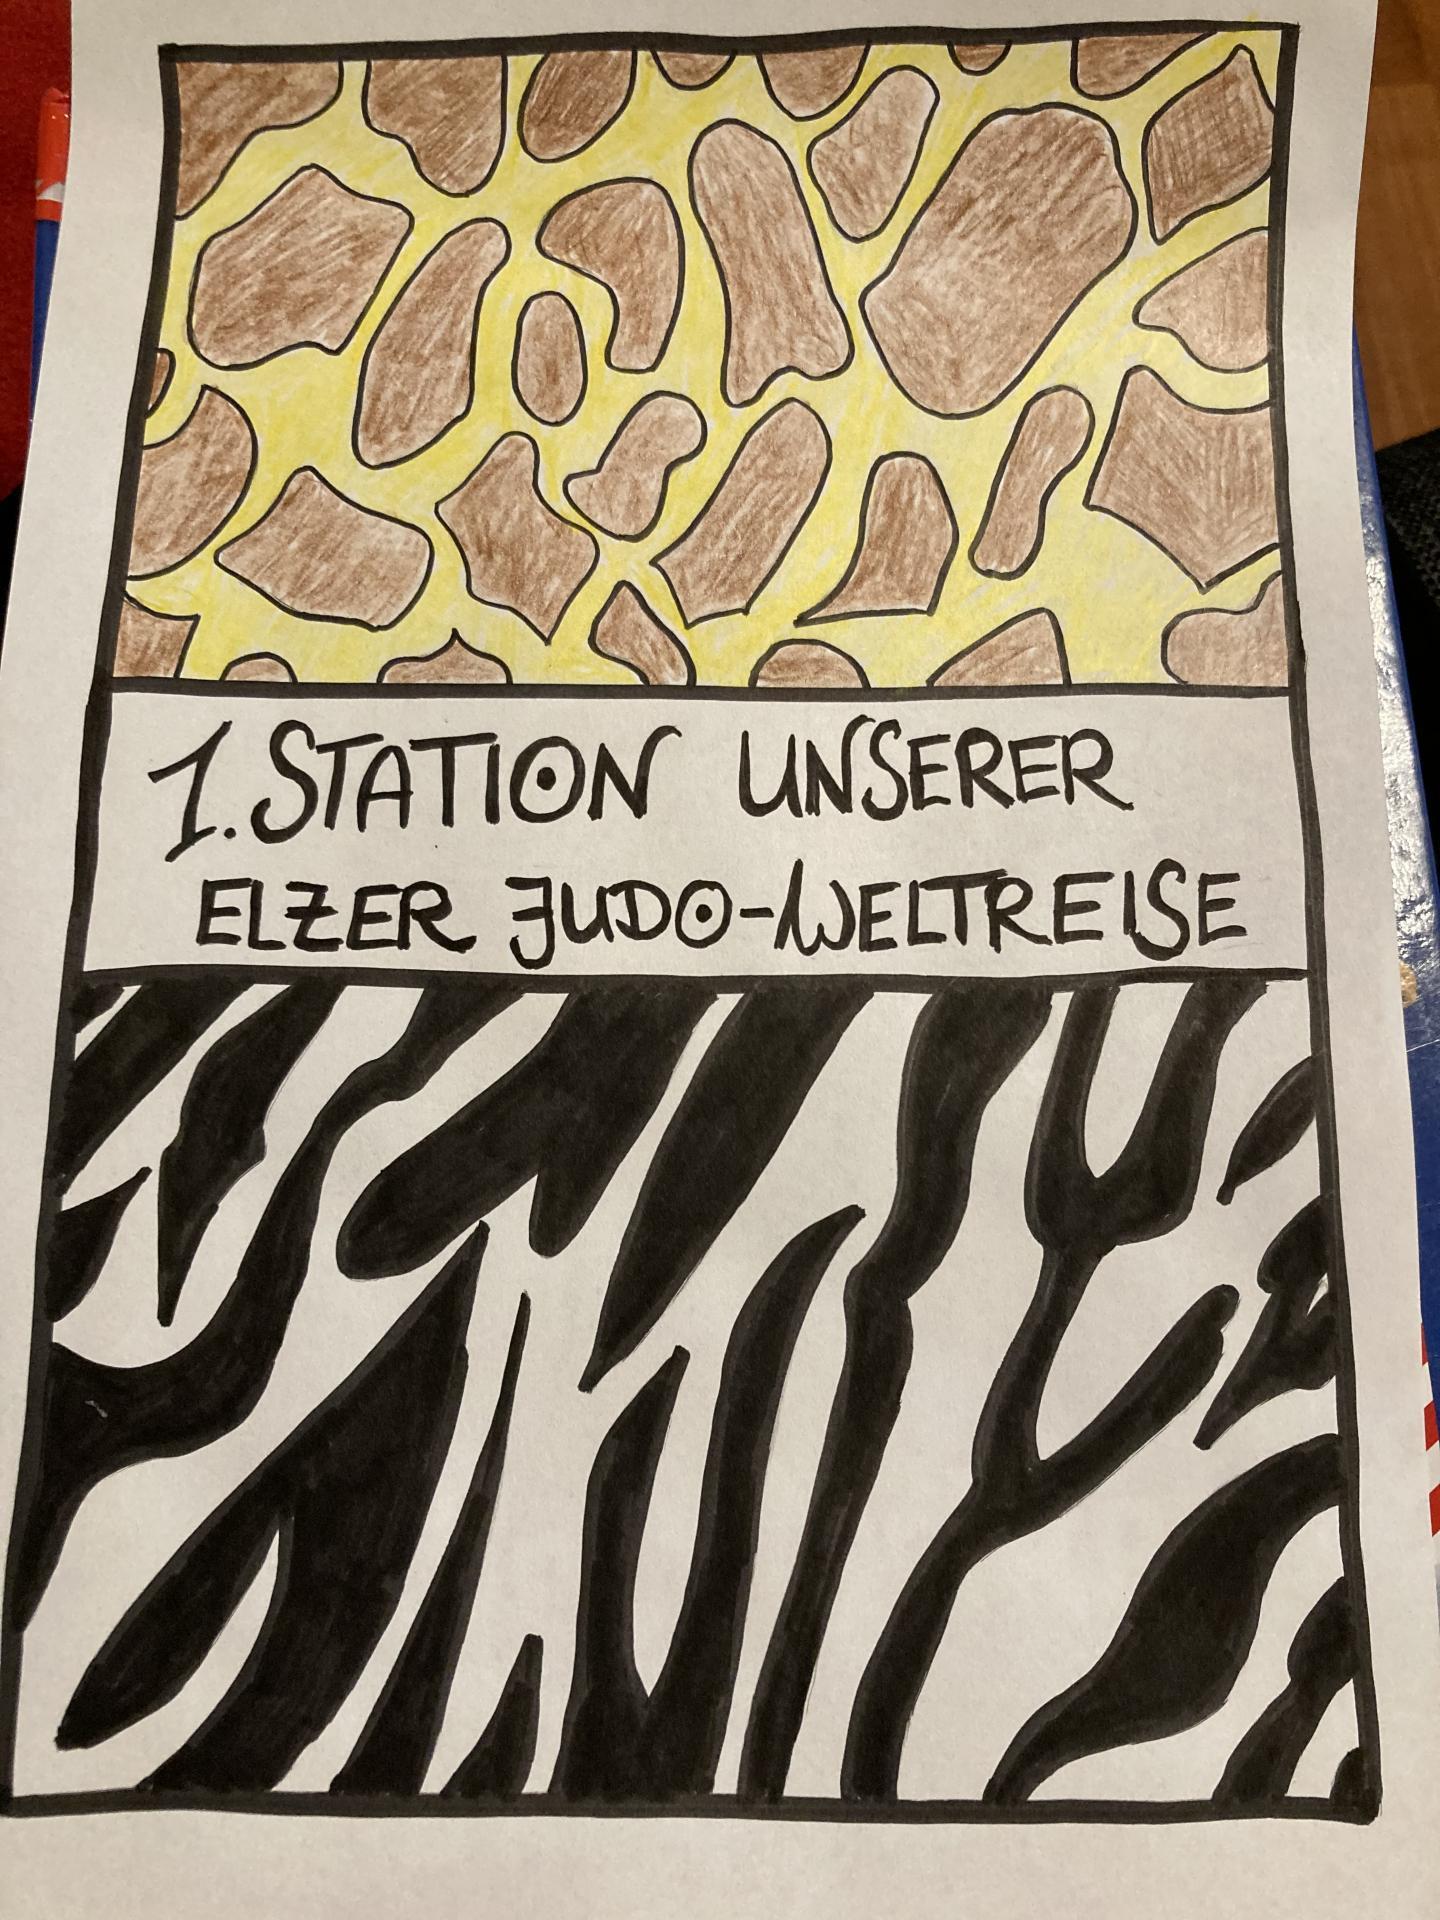 23.07.2020  - 1. Station